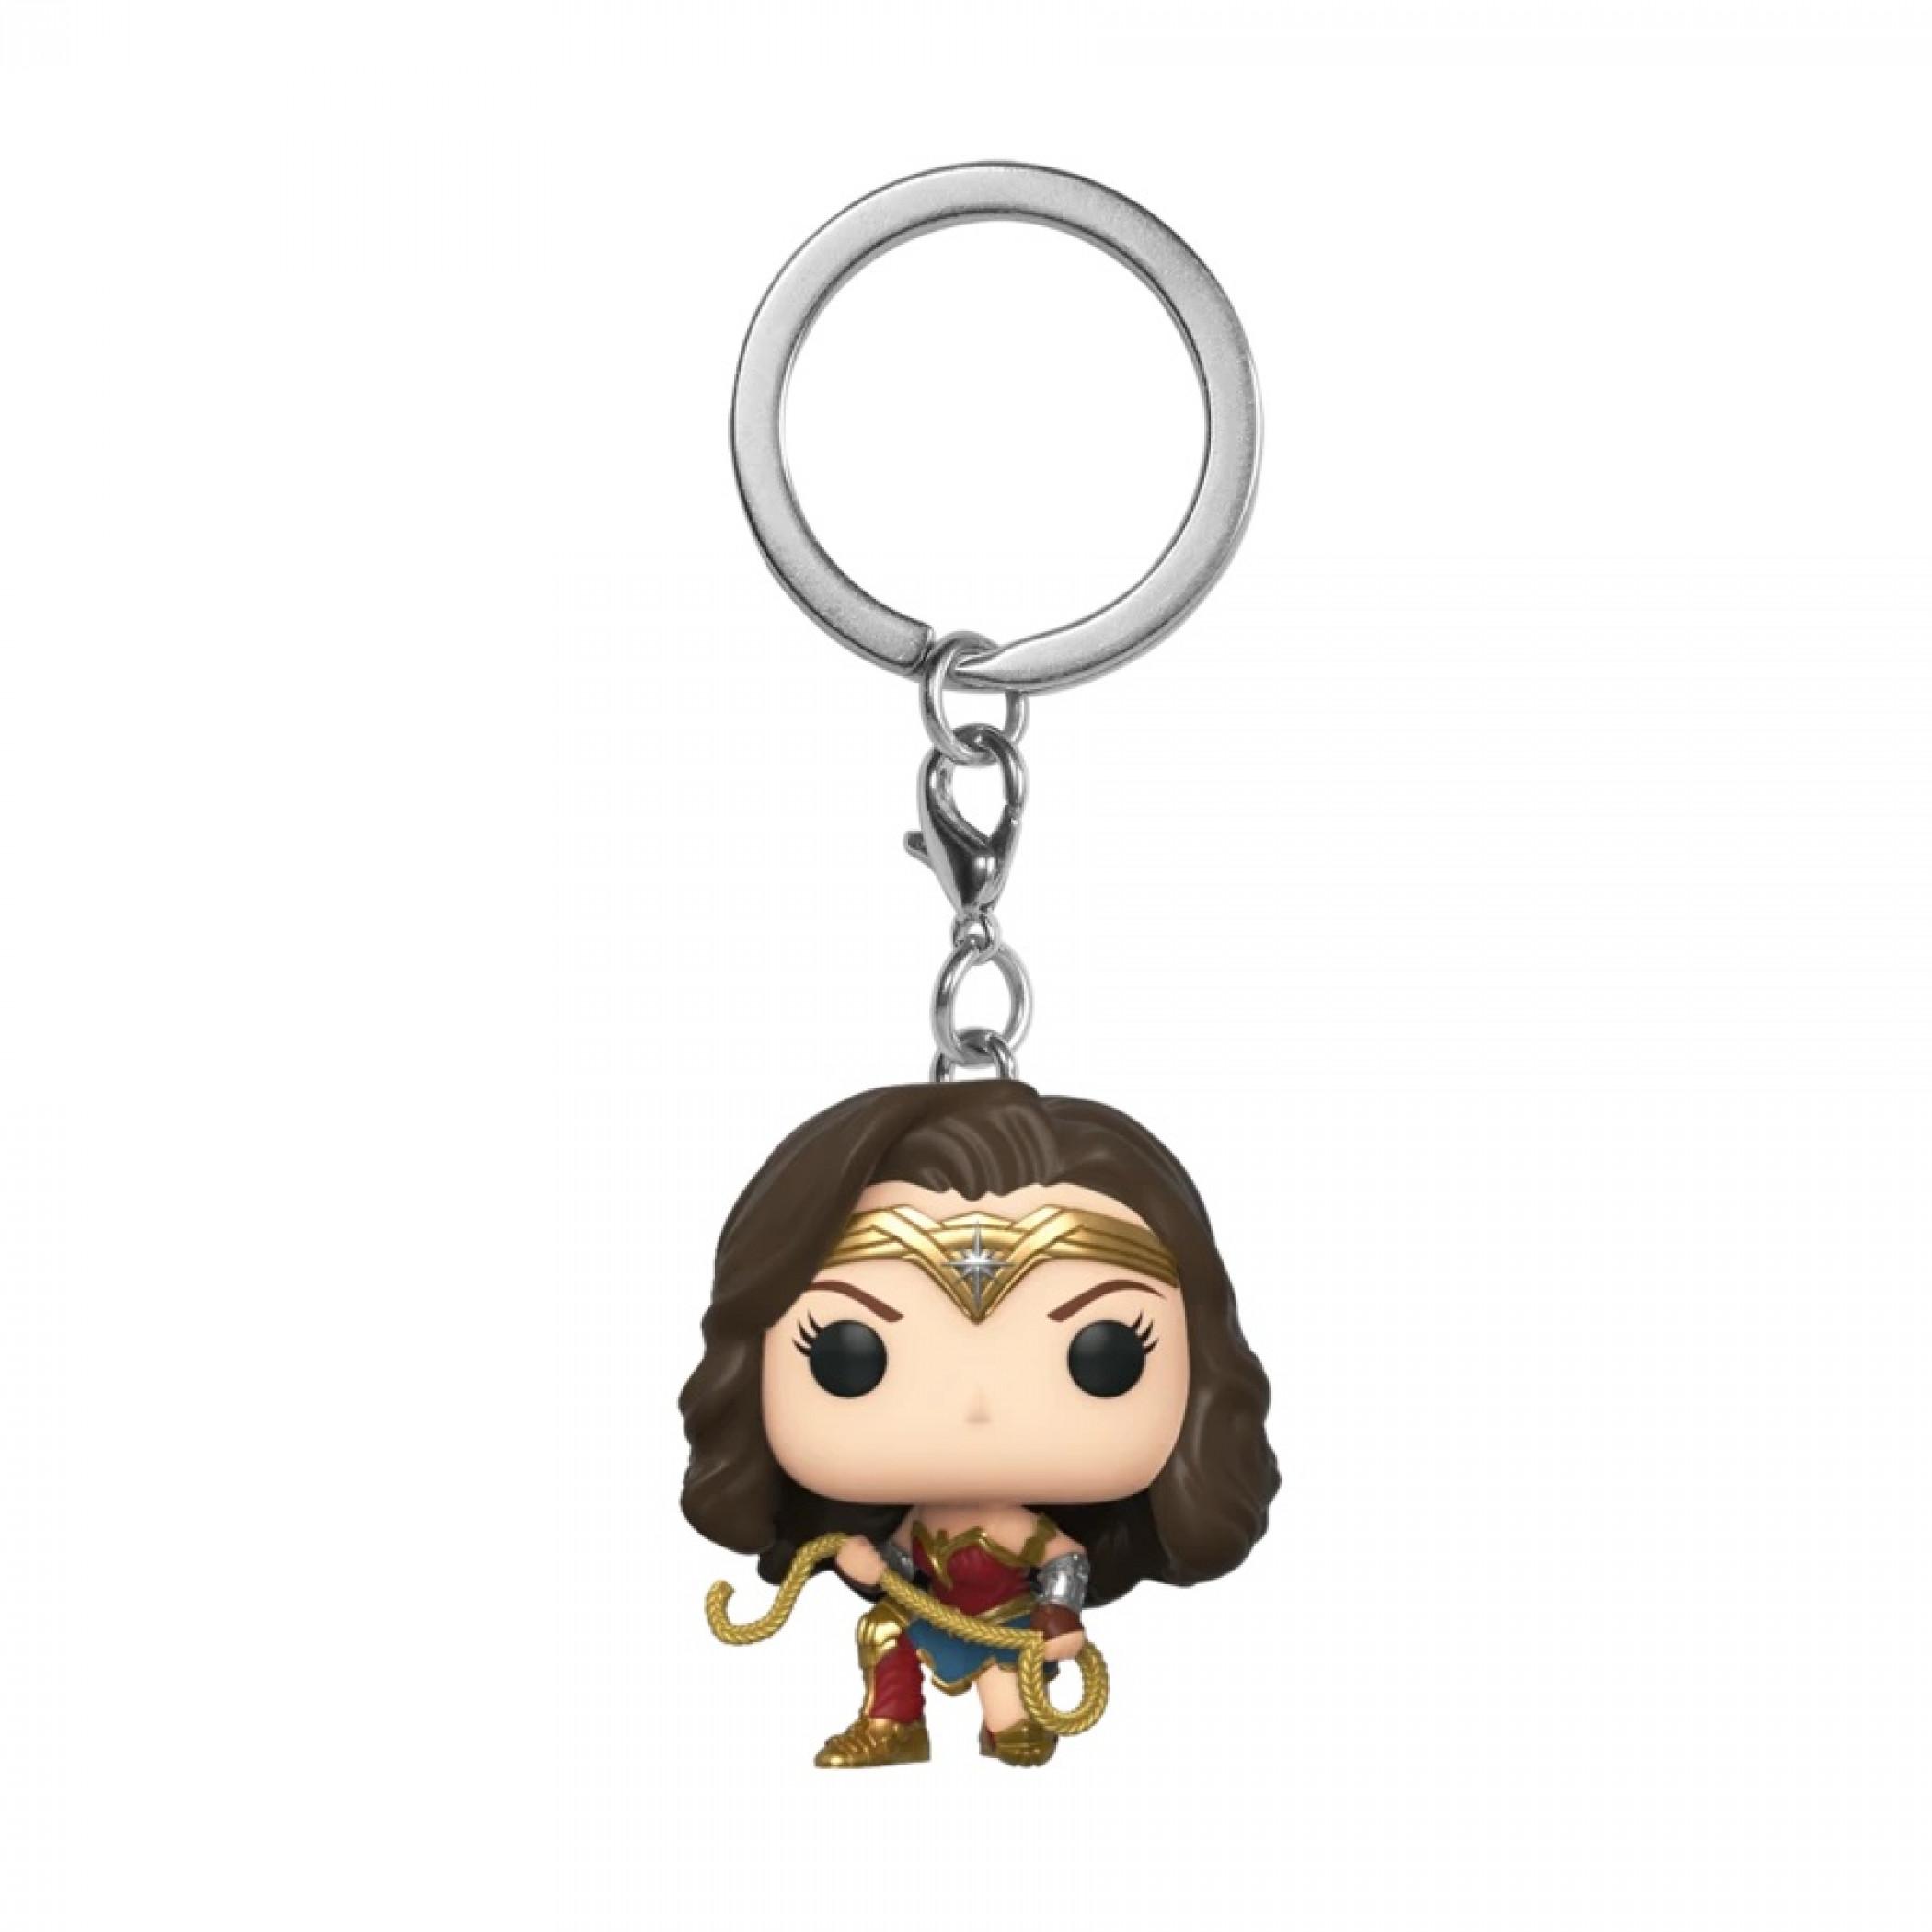 Funko Pop! Keychain: Wonder Woman 1984 - Wonder Woman w/ Lasso